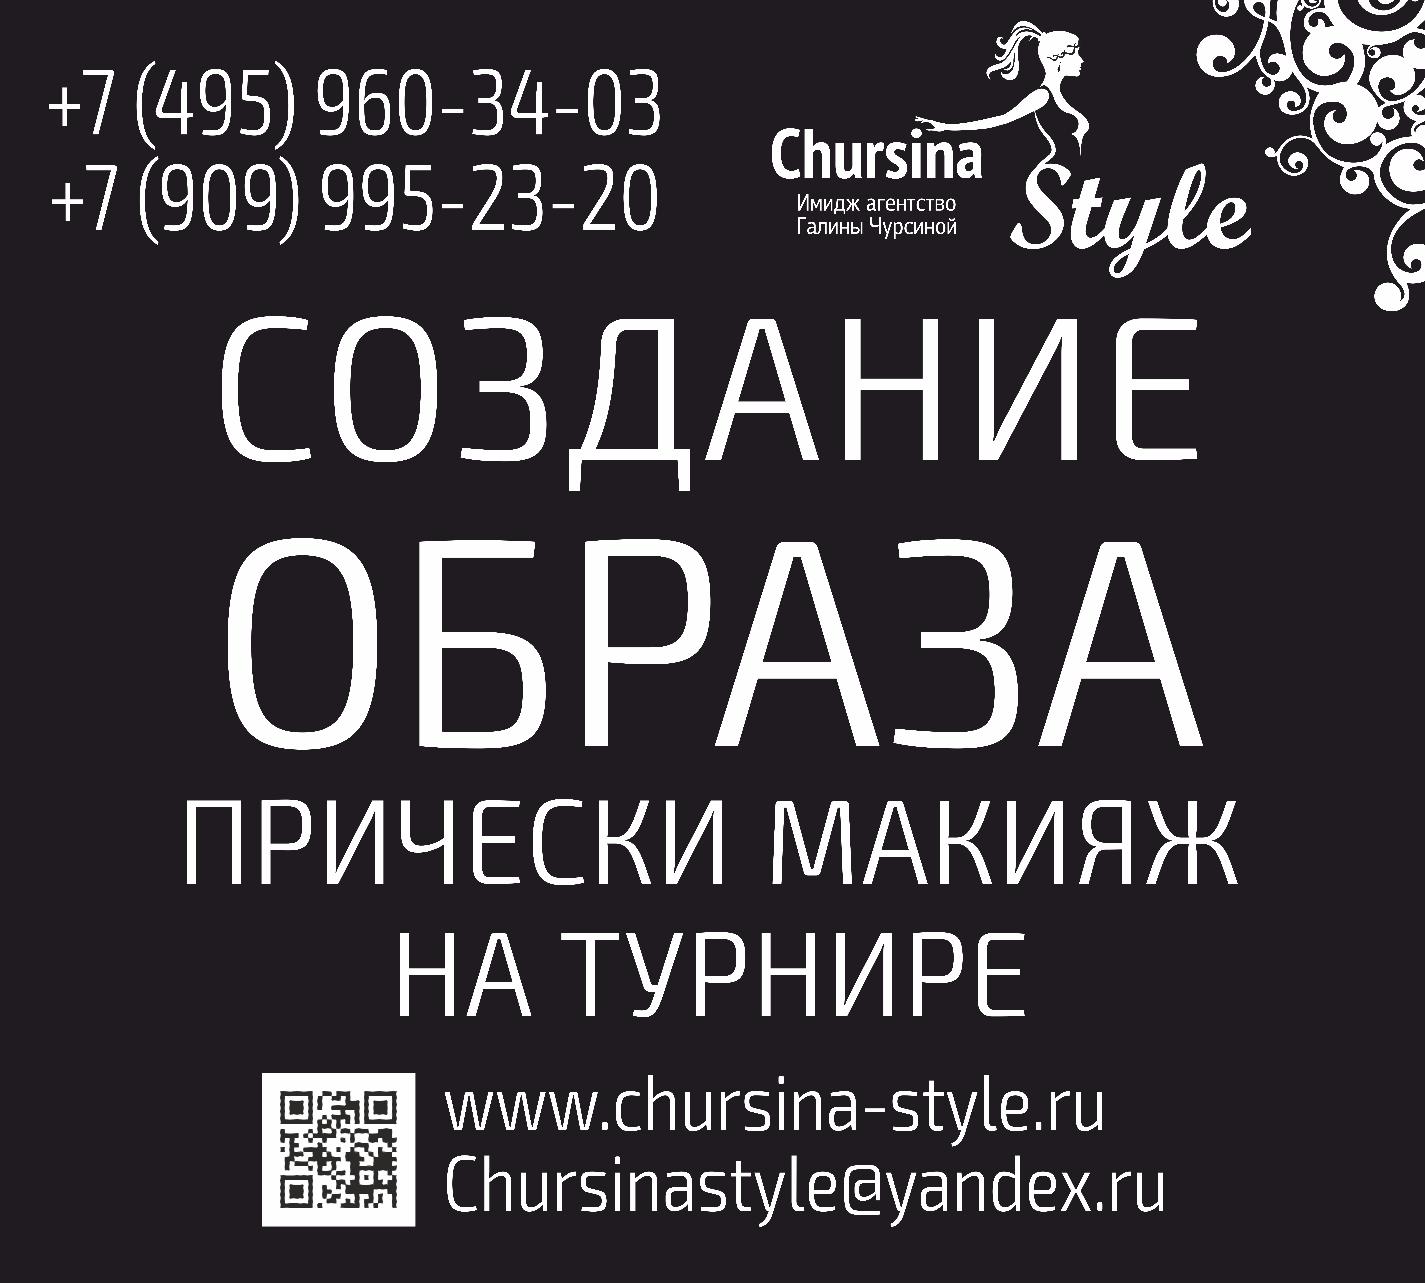 Chursinastyle RUS